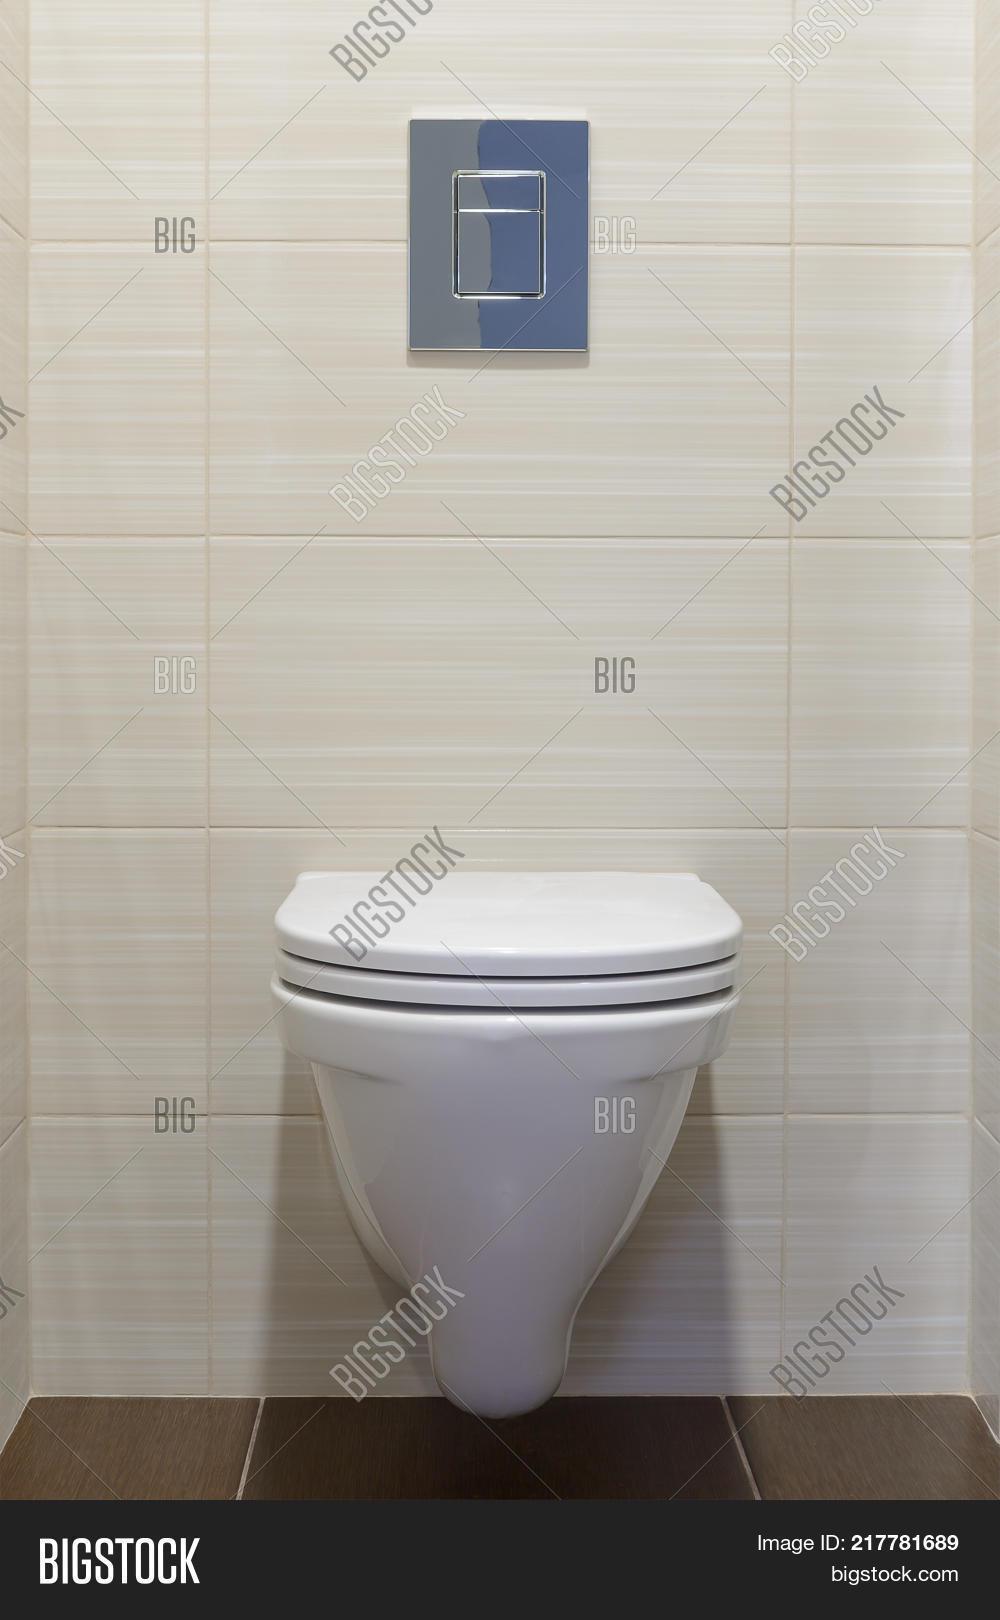 Built- Toilet Washroom Image & Photo (Free Trial) | Bigstock